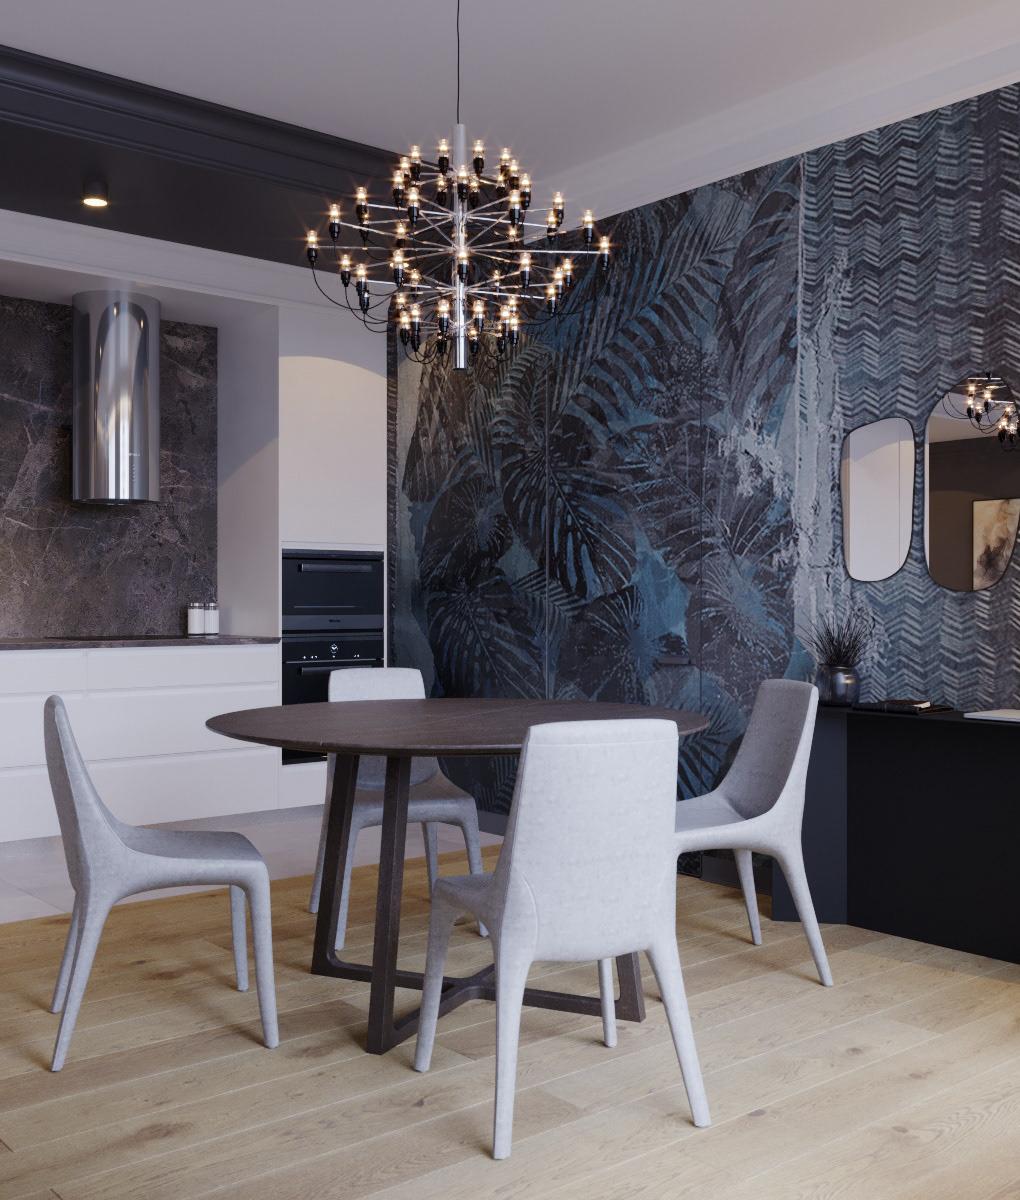 coronarenderer 3dsmax bucharest romania living dining design Interior